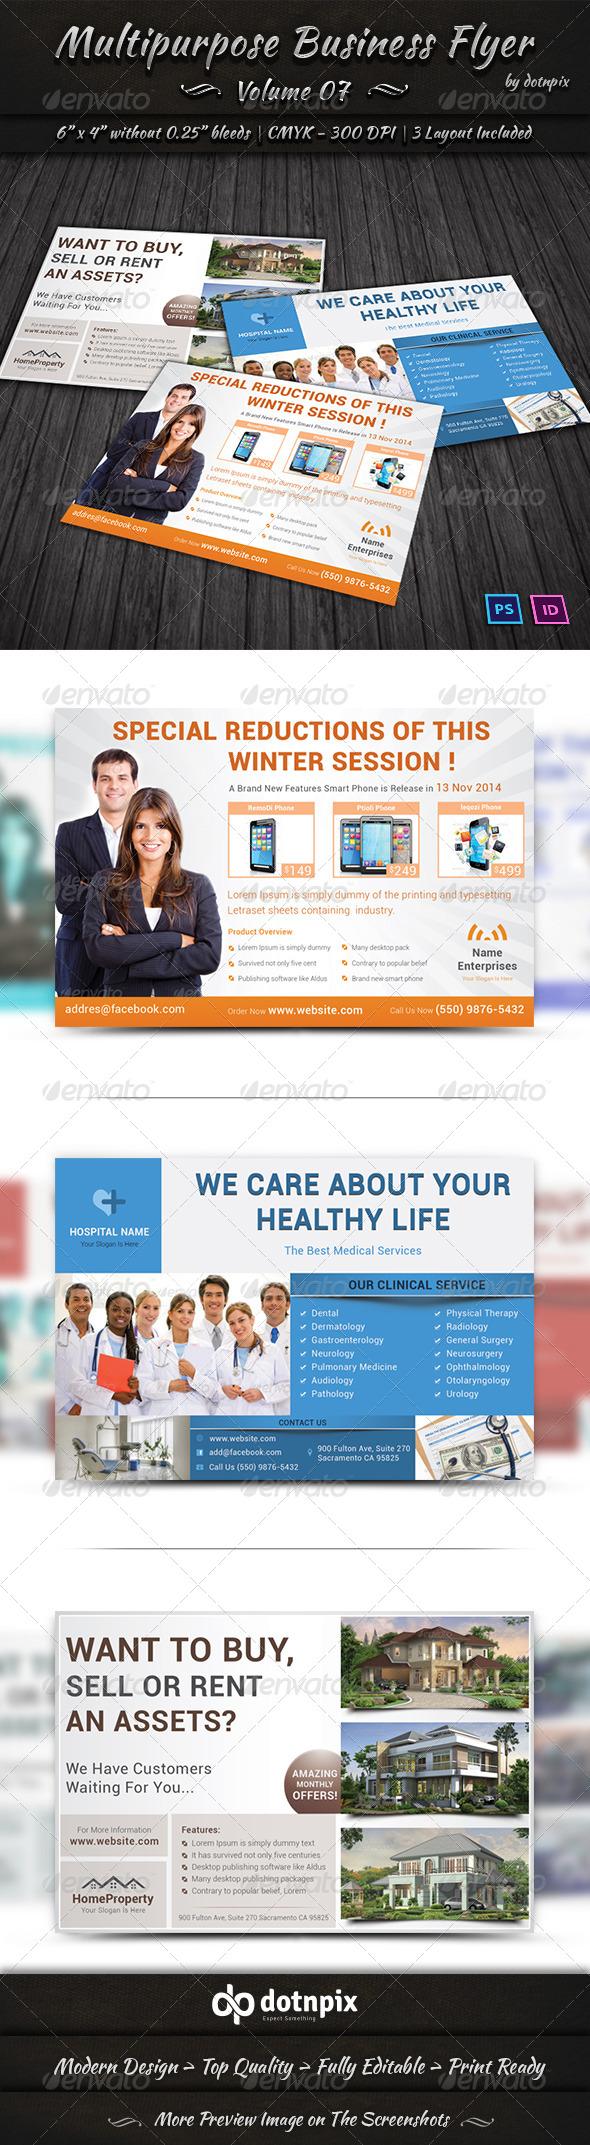 Multipurpose Business Flyer | Volume 7 - Corporate Flyers